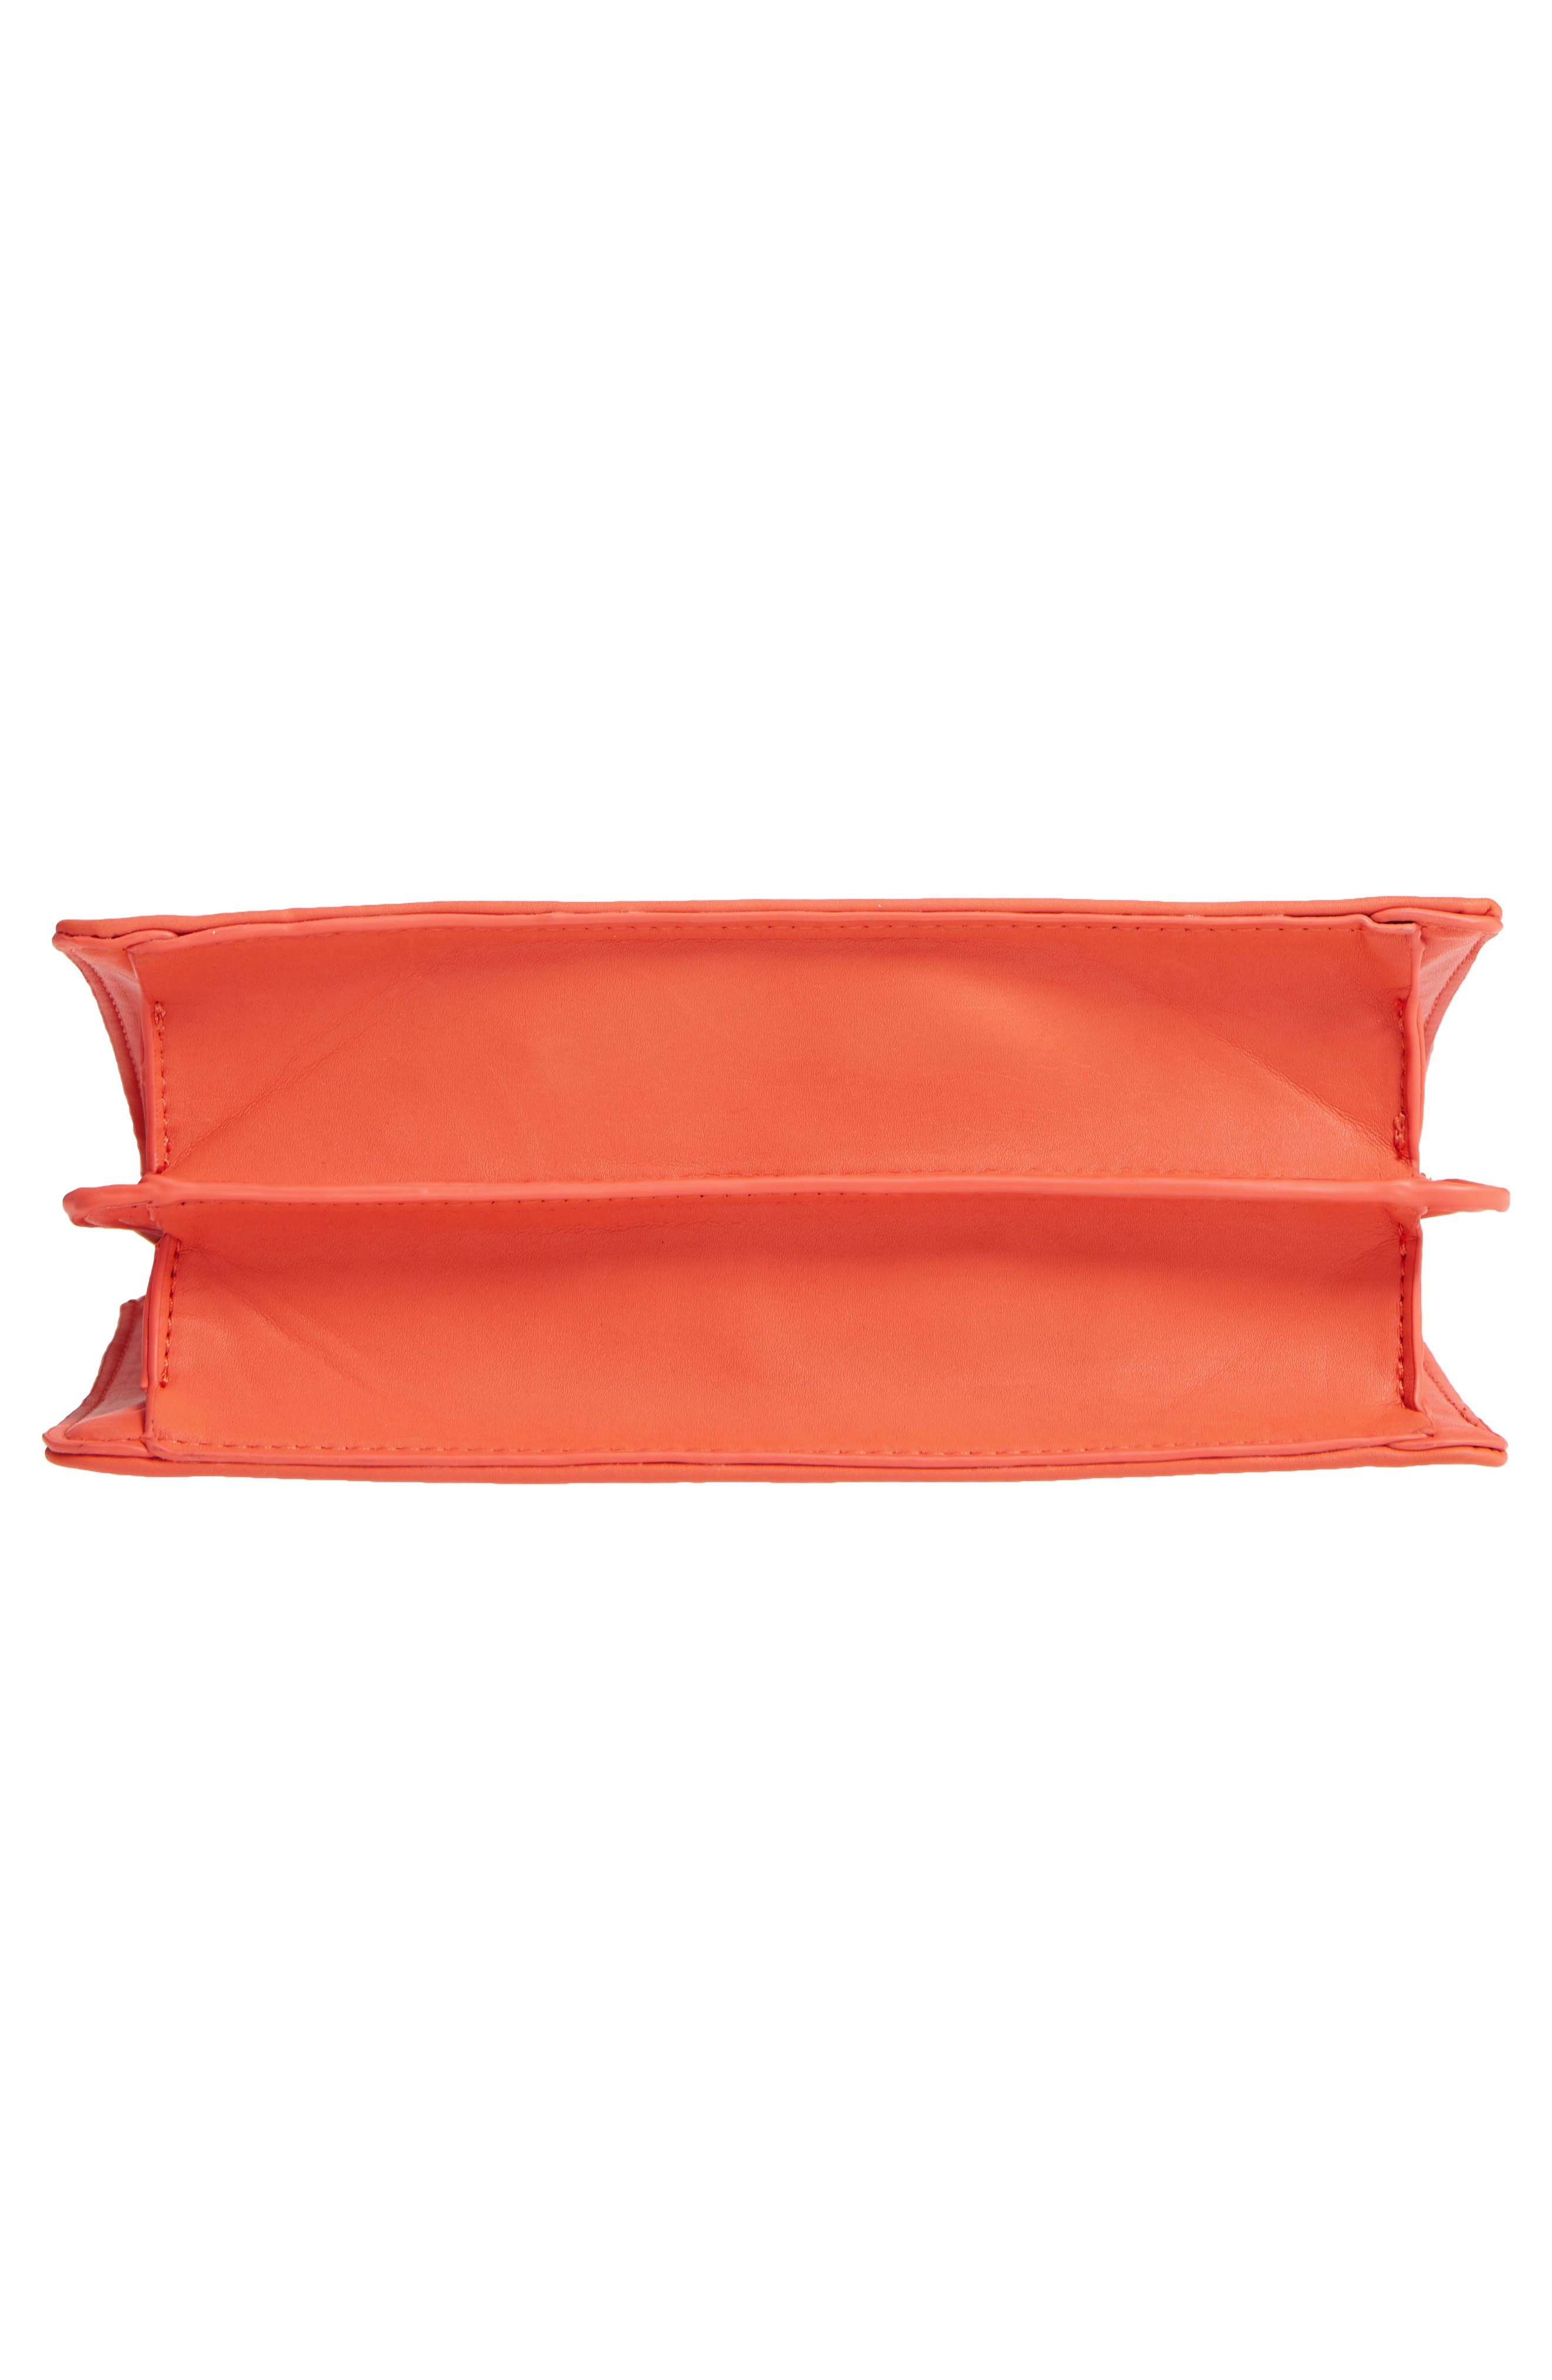 Faux Leather Frame Handbag,                             Alternate thumbnail 6, color,                             Red